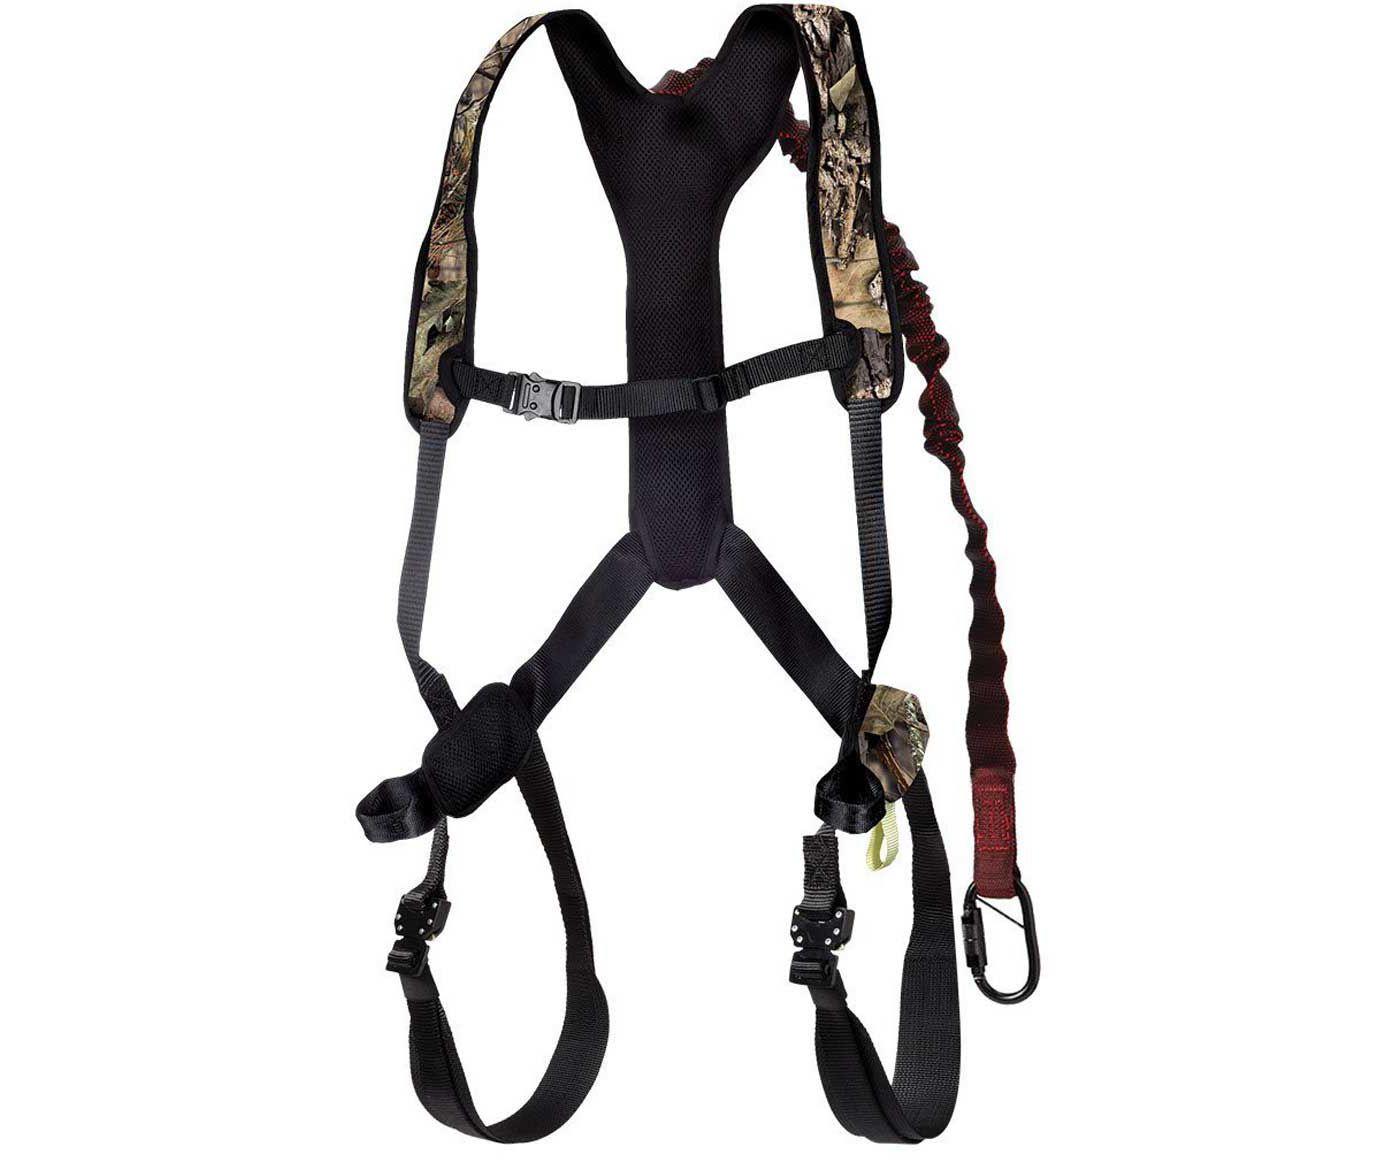 Gorilla Gear G-Tac Air Safety Harness